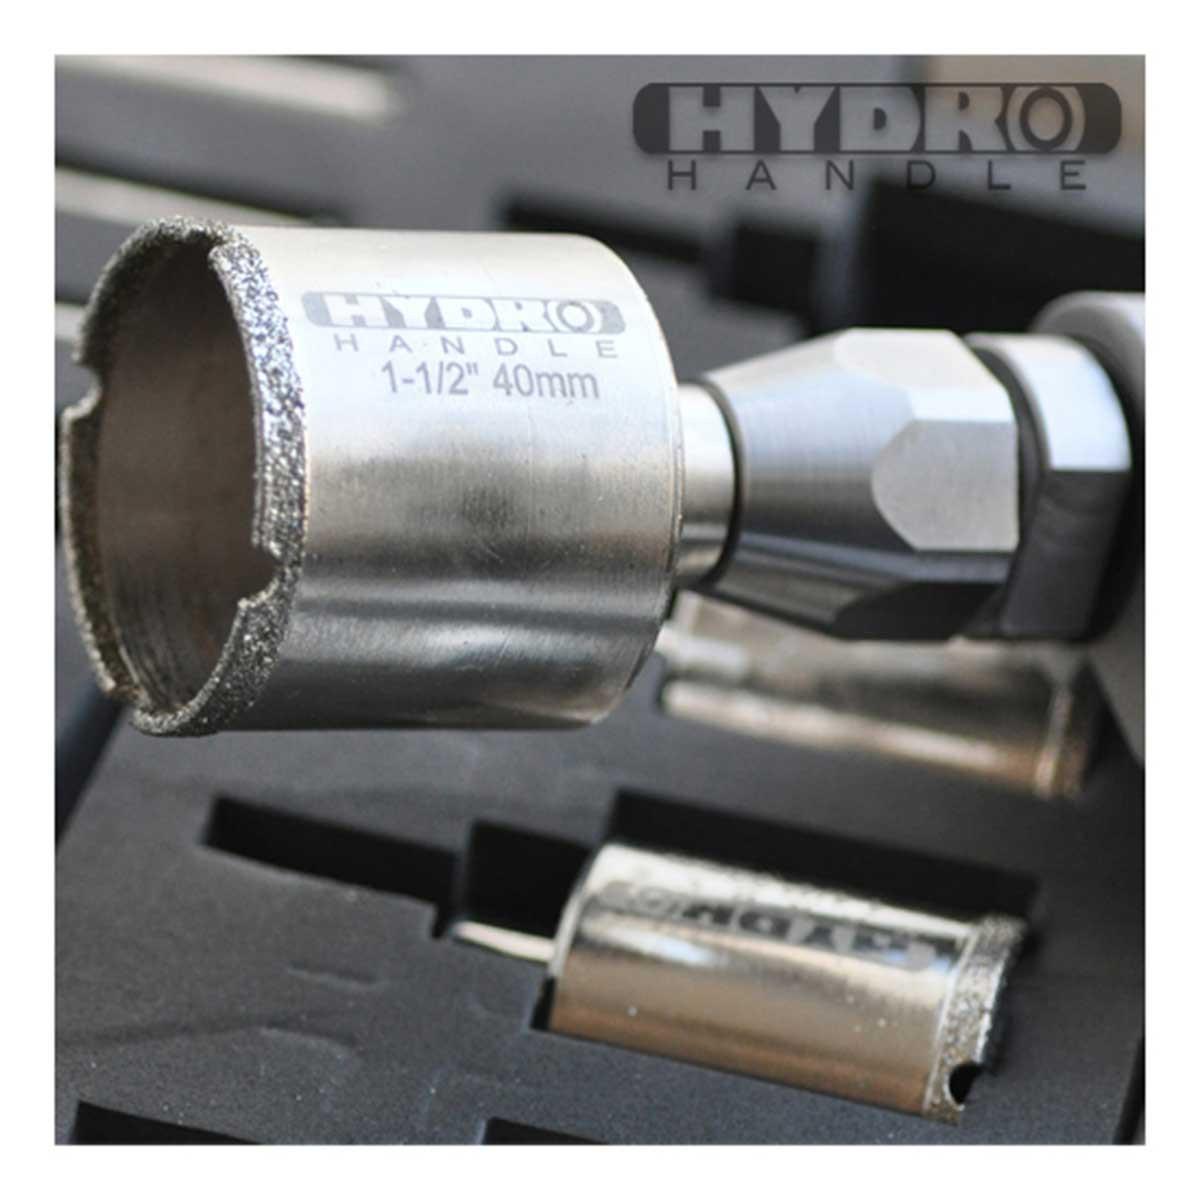 1-1/2 inch hydro handle bit